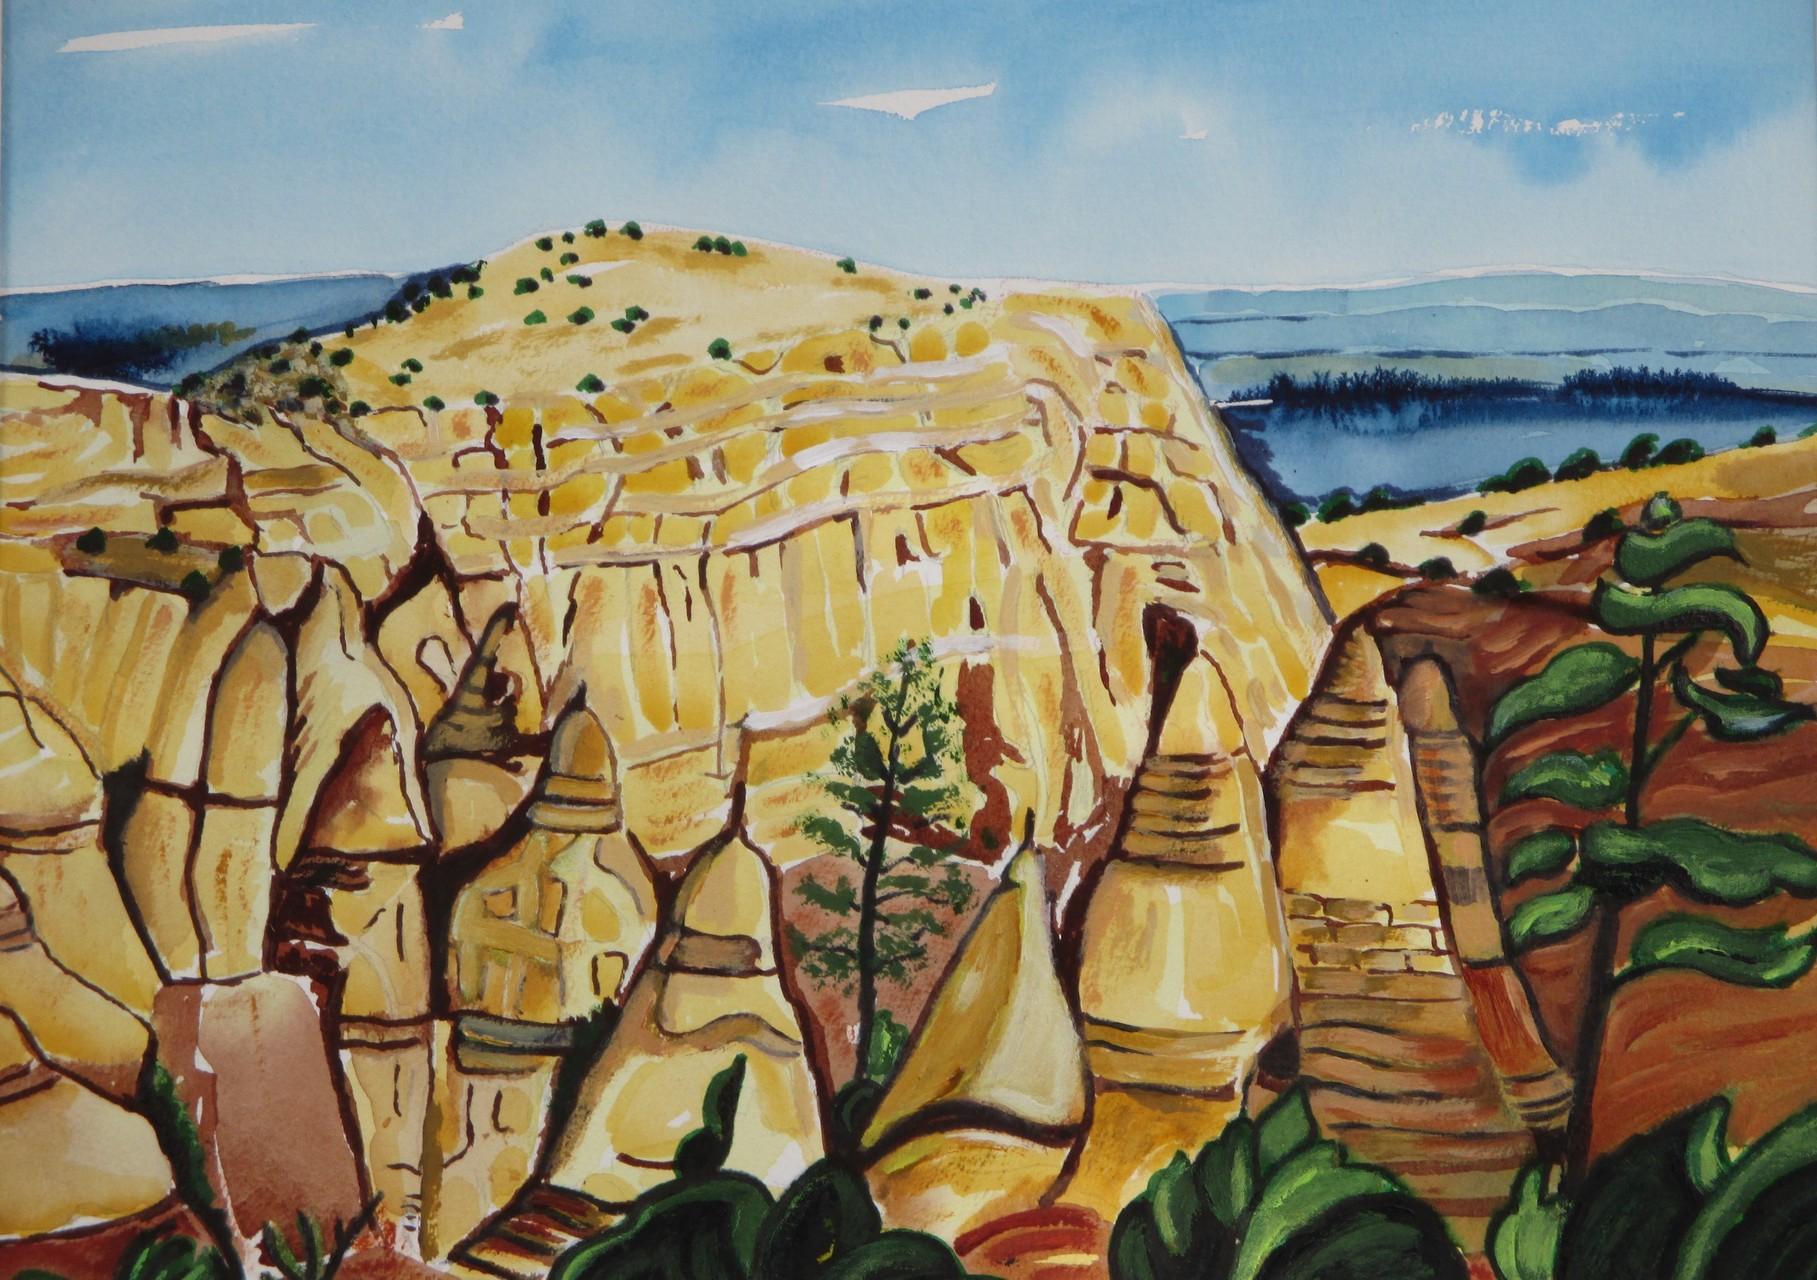 Tent Rocks, watercolor, 15.5 x 11.5, 2015